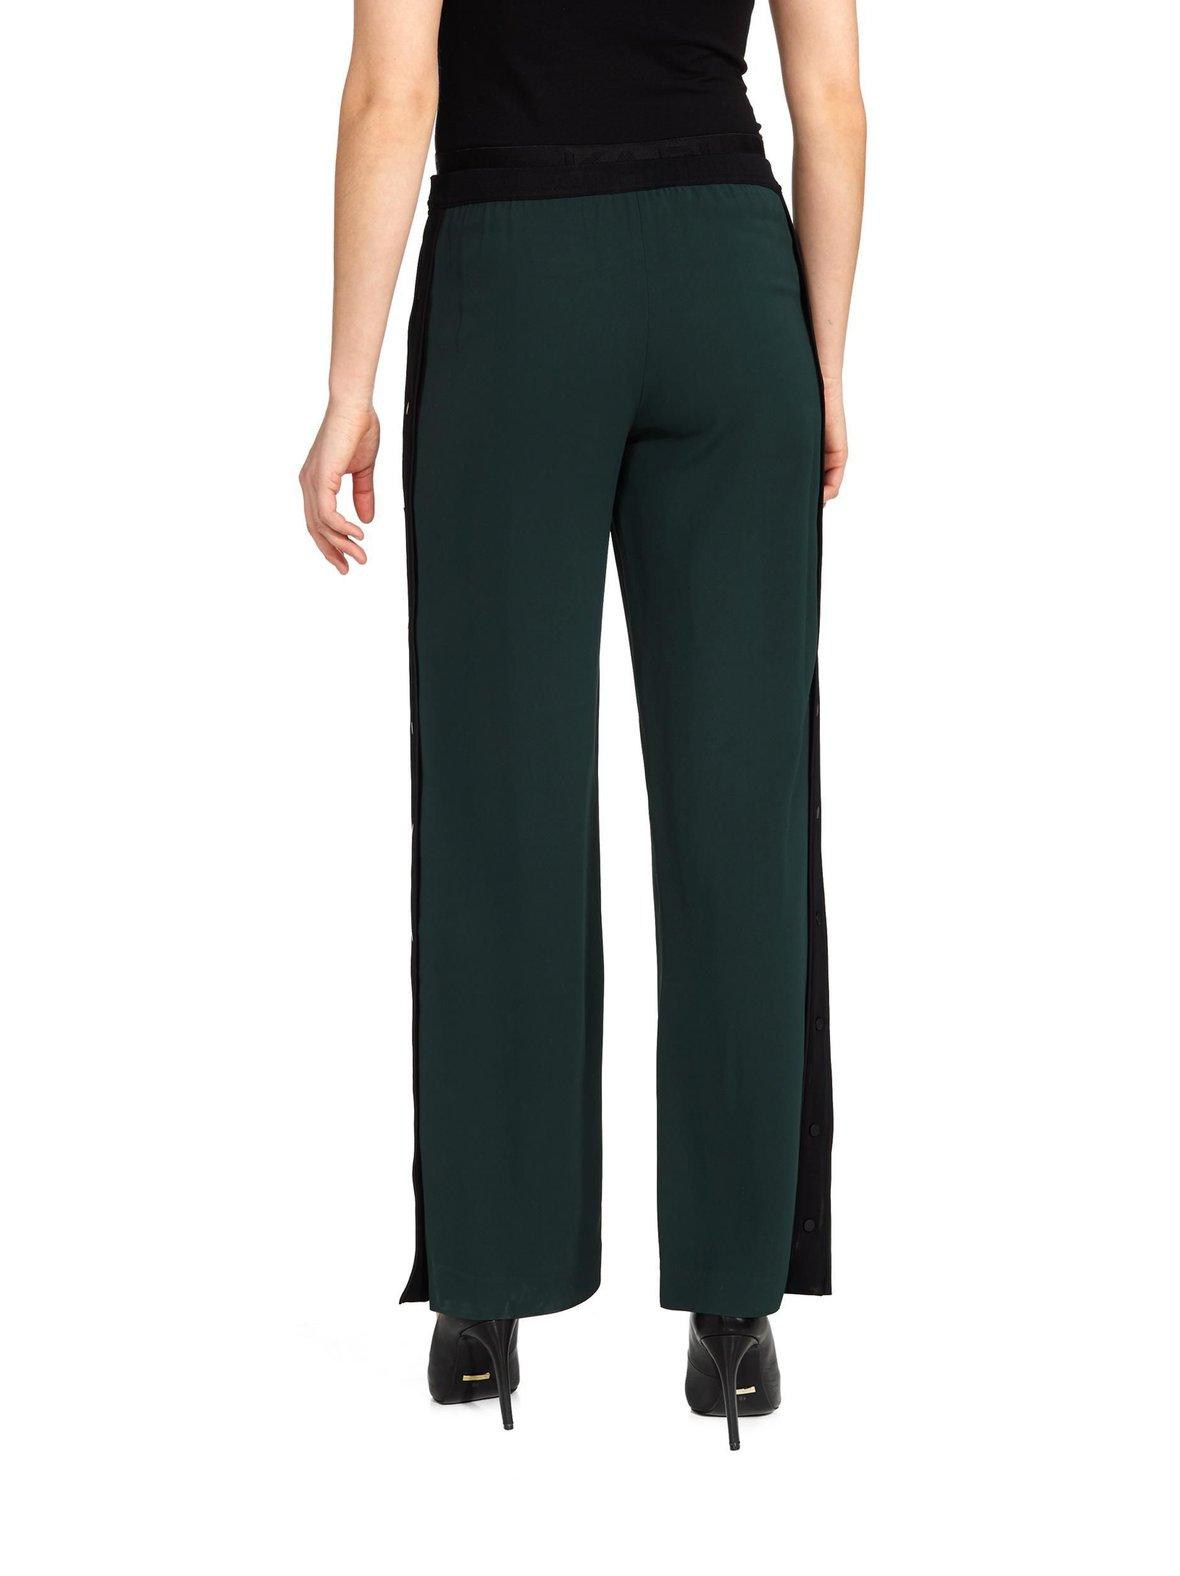 Green Gable (vihreä) Karl Lagerfeld Housut 86KW1002  5dd4c4596d